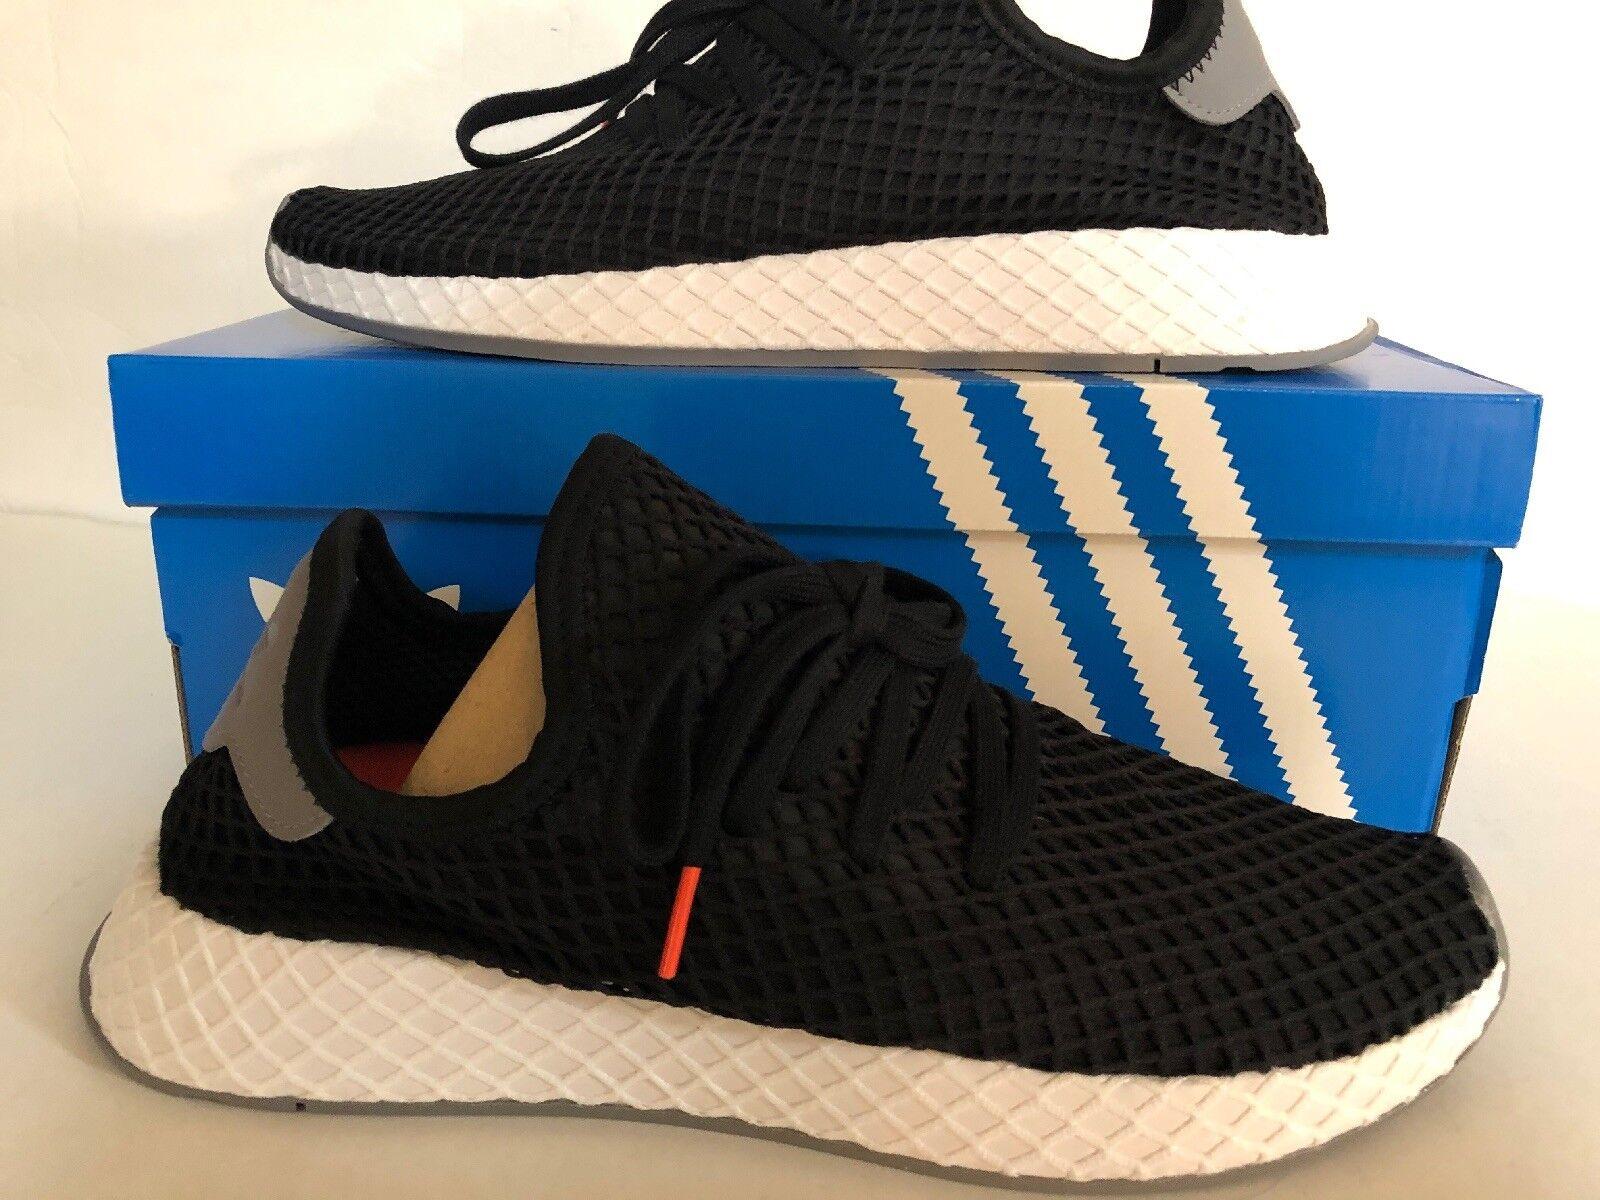 42acc7d9e Adidas Originals Deerupt Runner Black White Mens Mens Mens Lifestyle  Sneaker B41765 SZ 9.5 c3226f